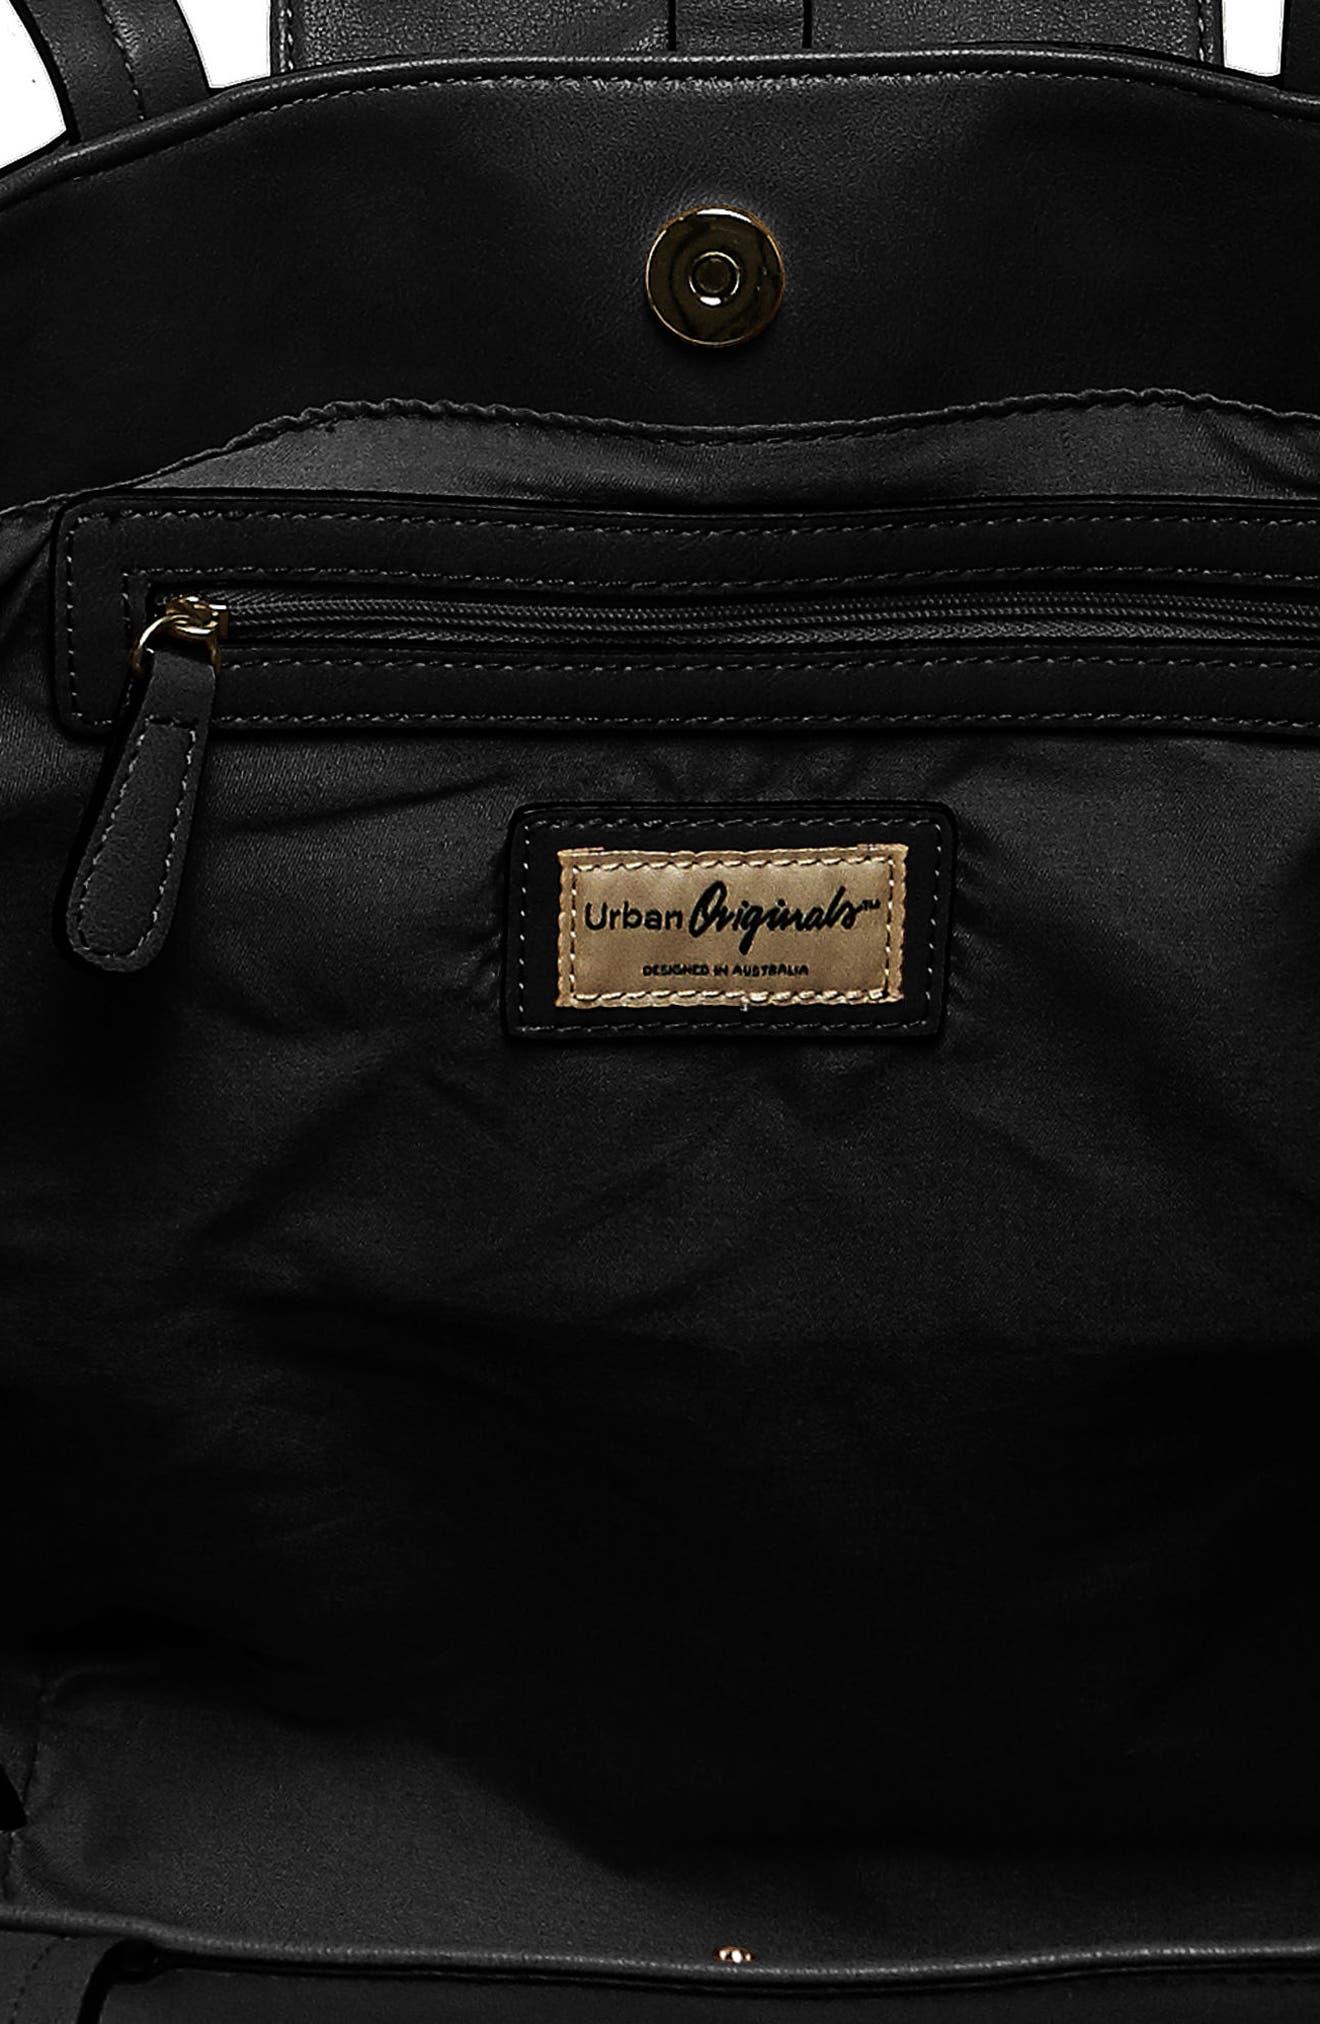 Urban Orginals Desire Vegan Leather Bucket Bag,                             Alternate thumbnail 3, color,                             Black